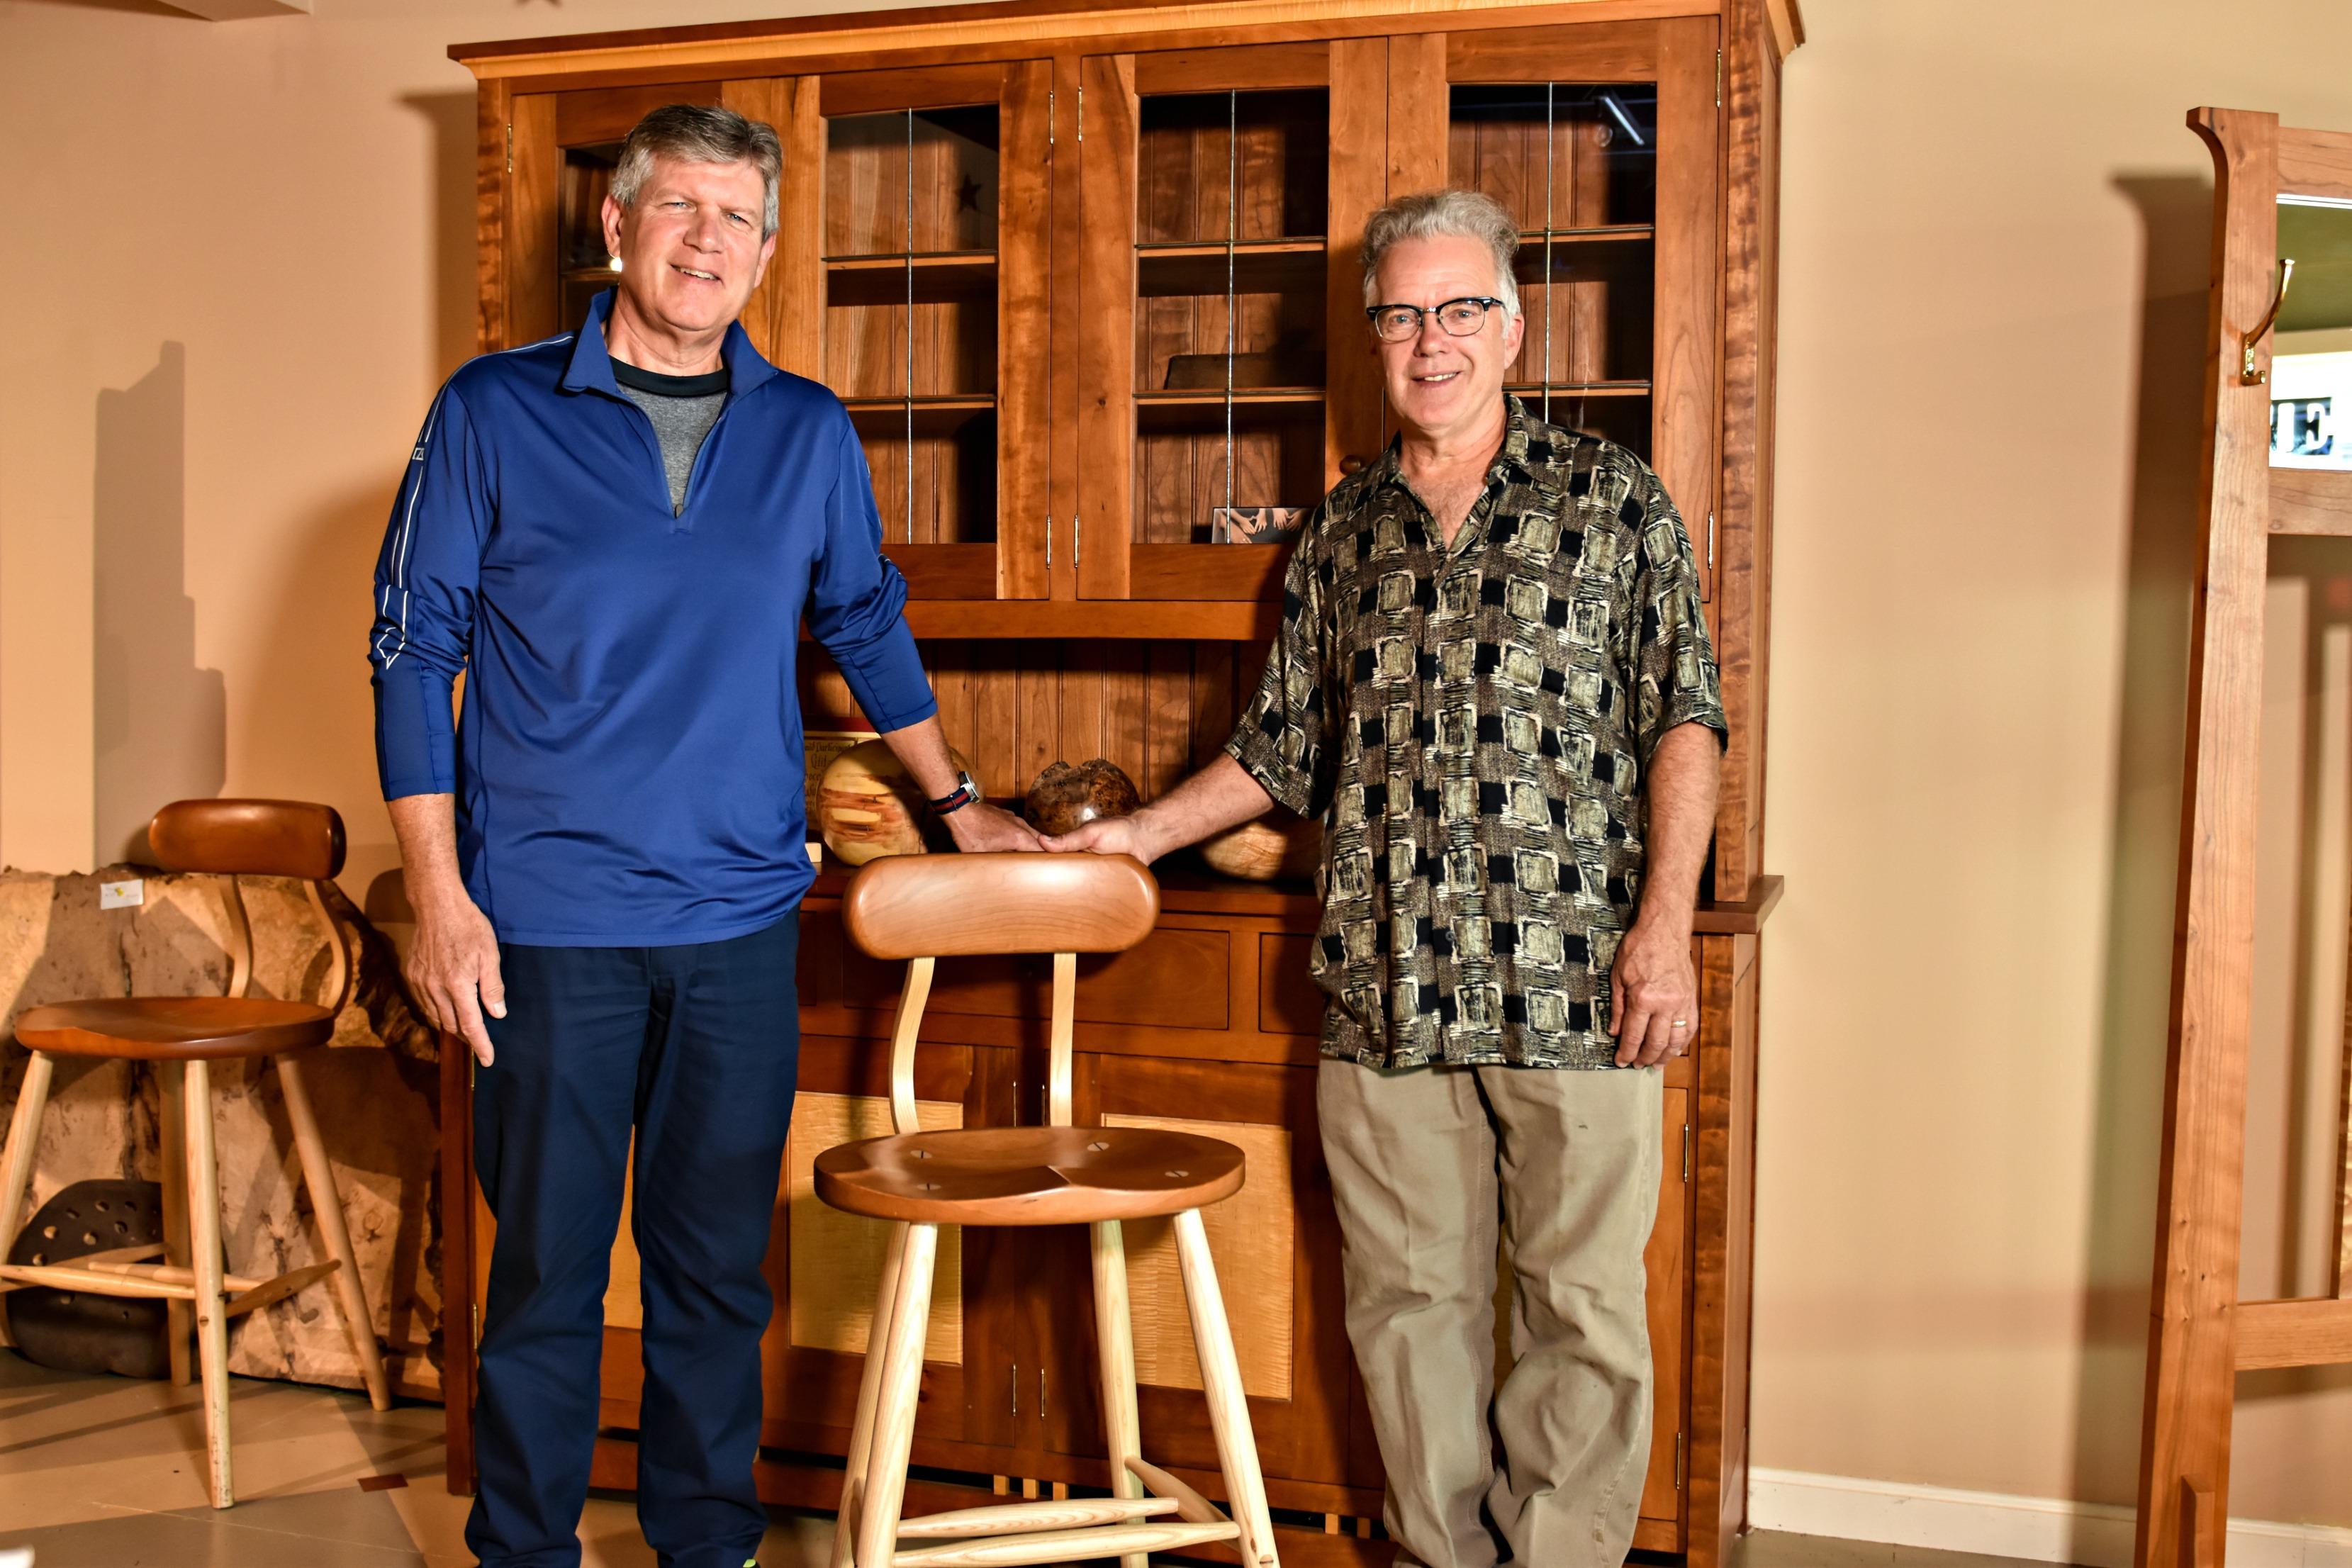 Thomas Morton and Jeff Ebert shaking hands